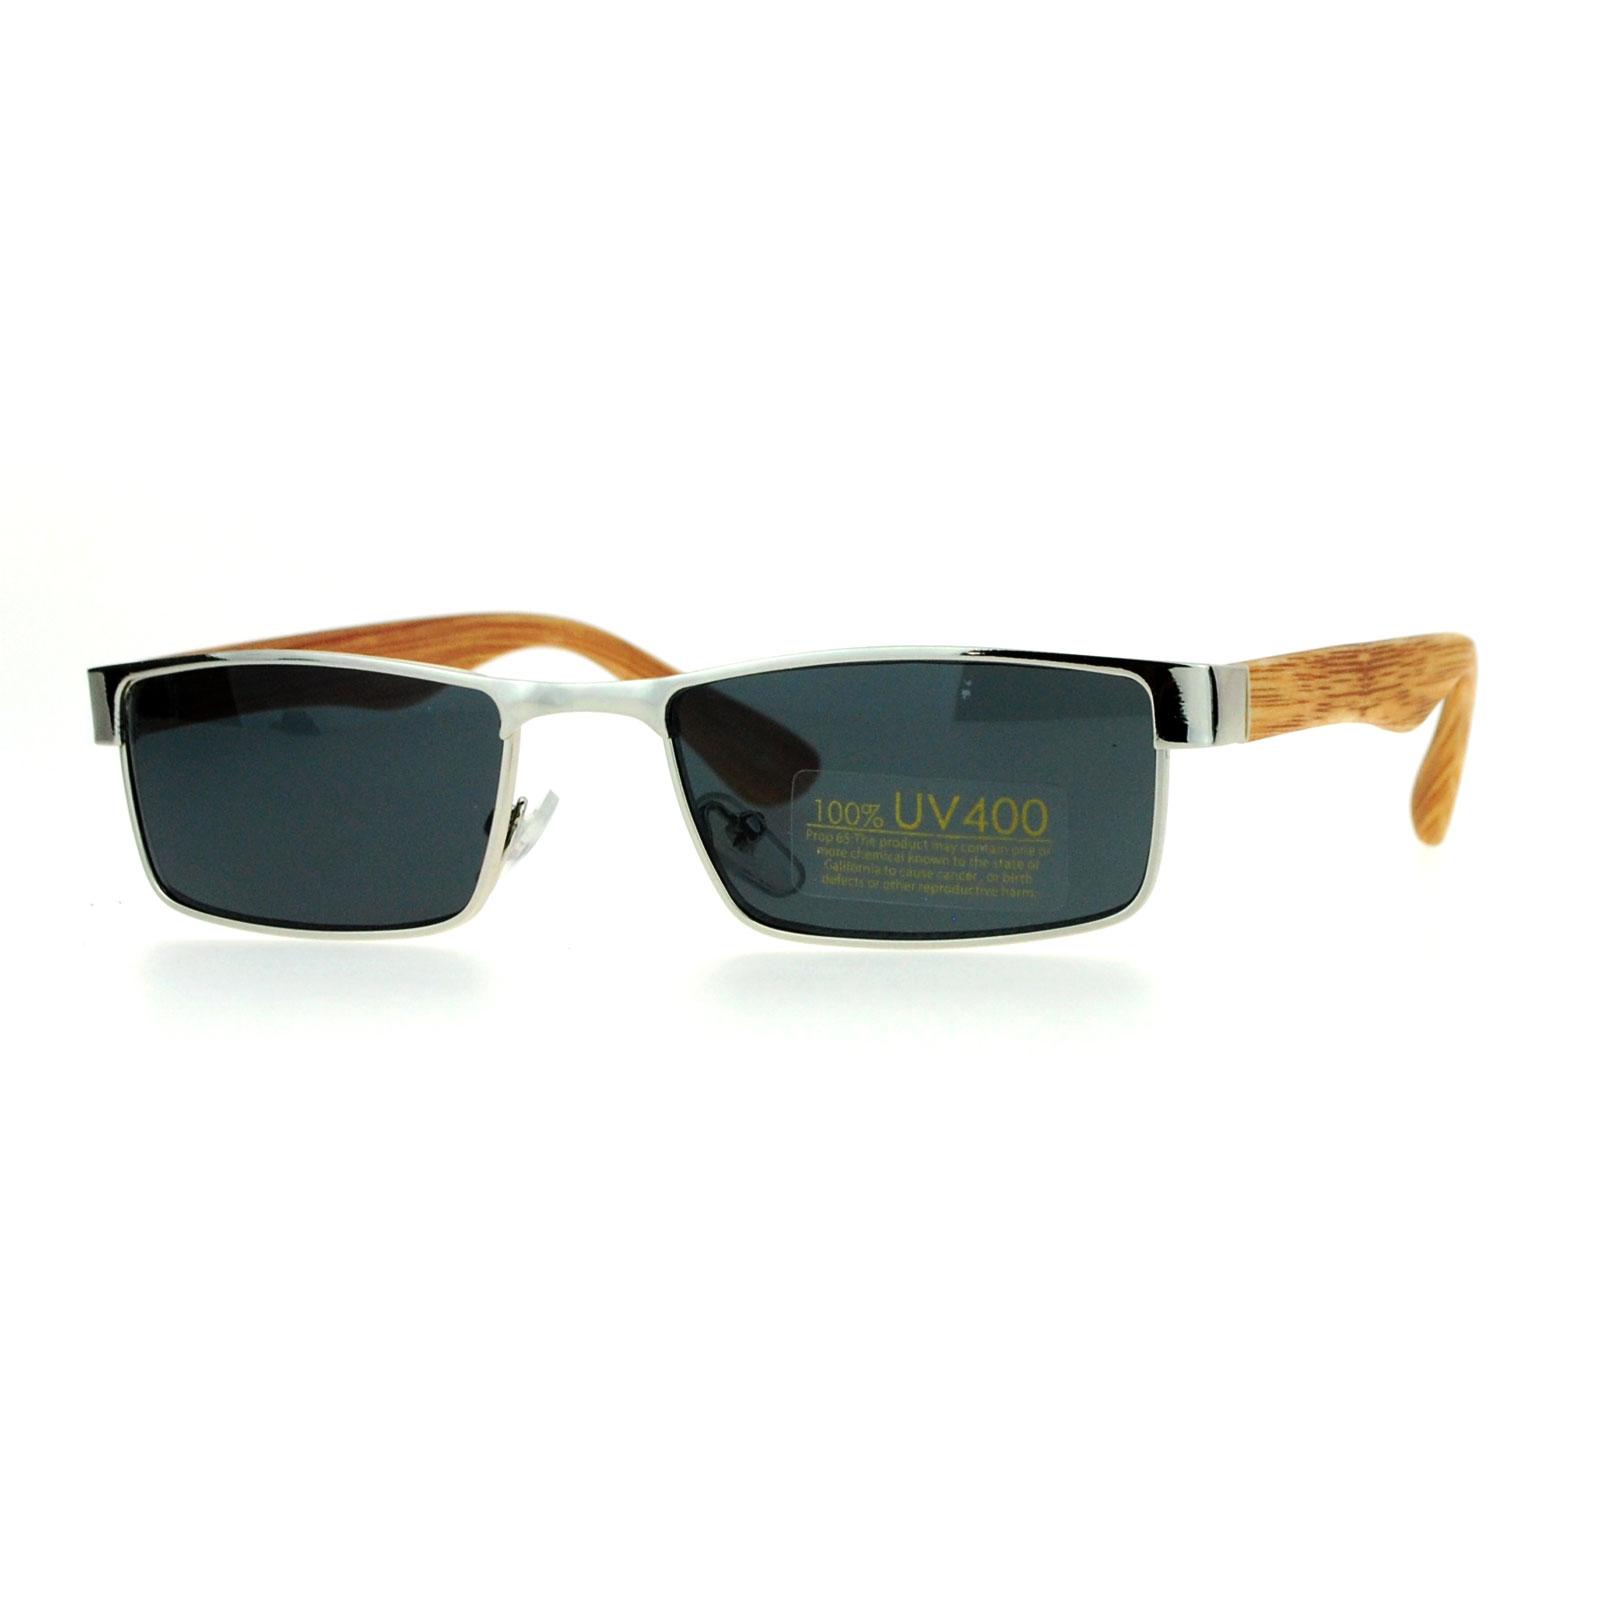 ffa81ac4f2ee Thin Rectangular Sunglasses